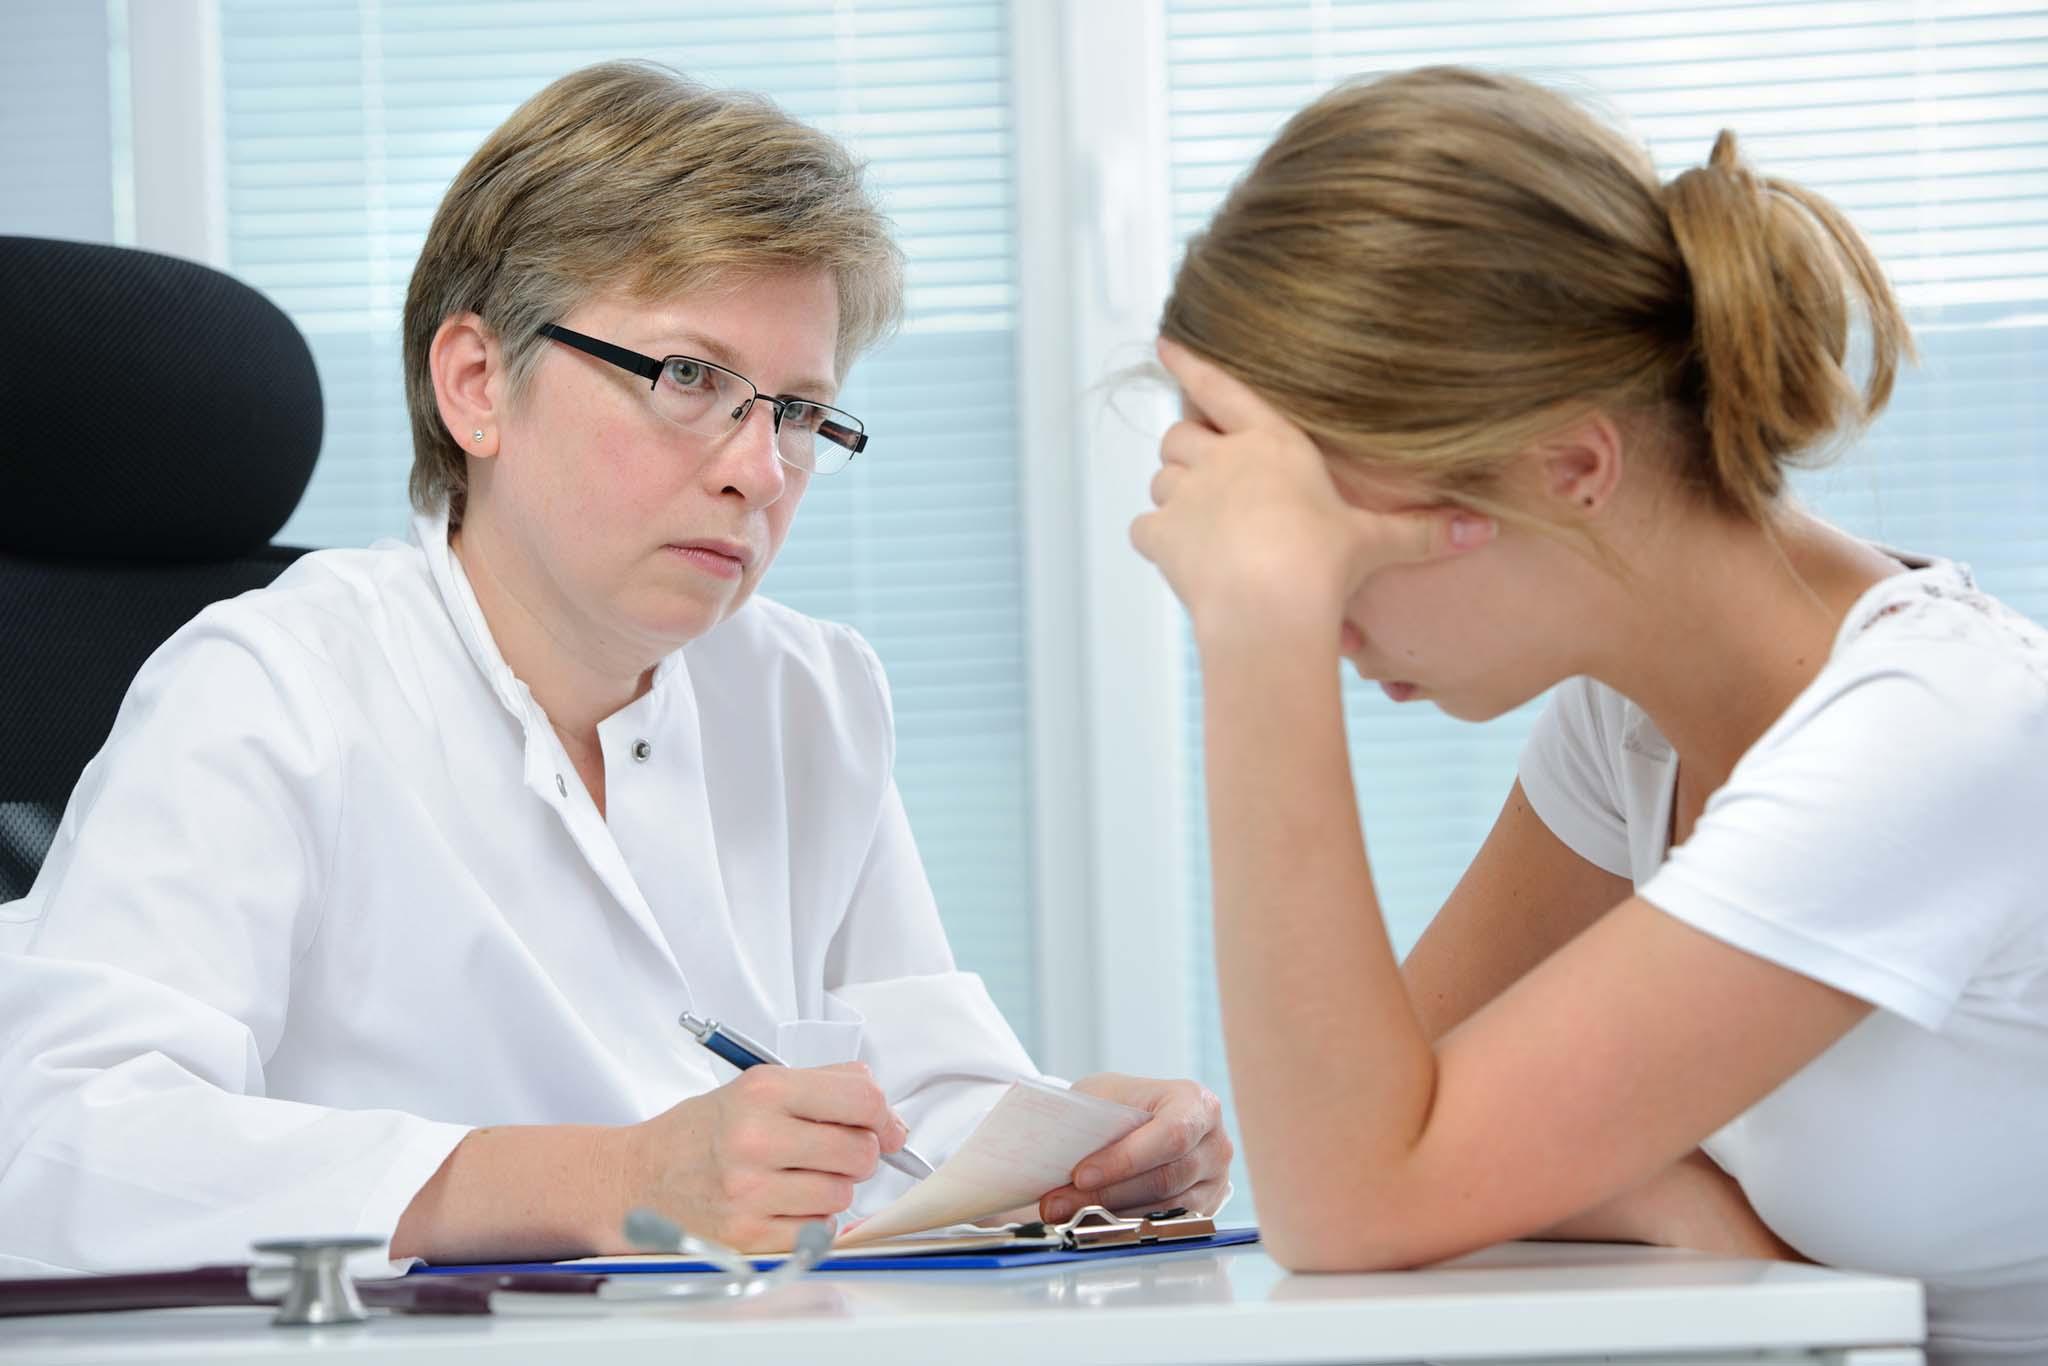 Признаки остеохондроза у женщин